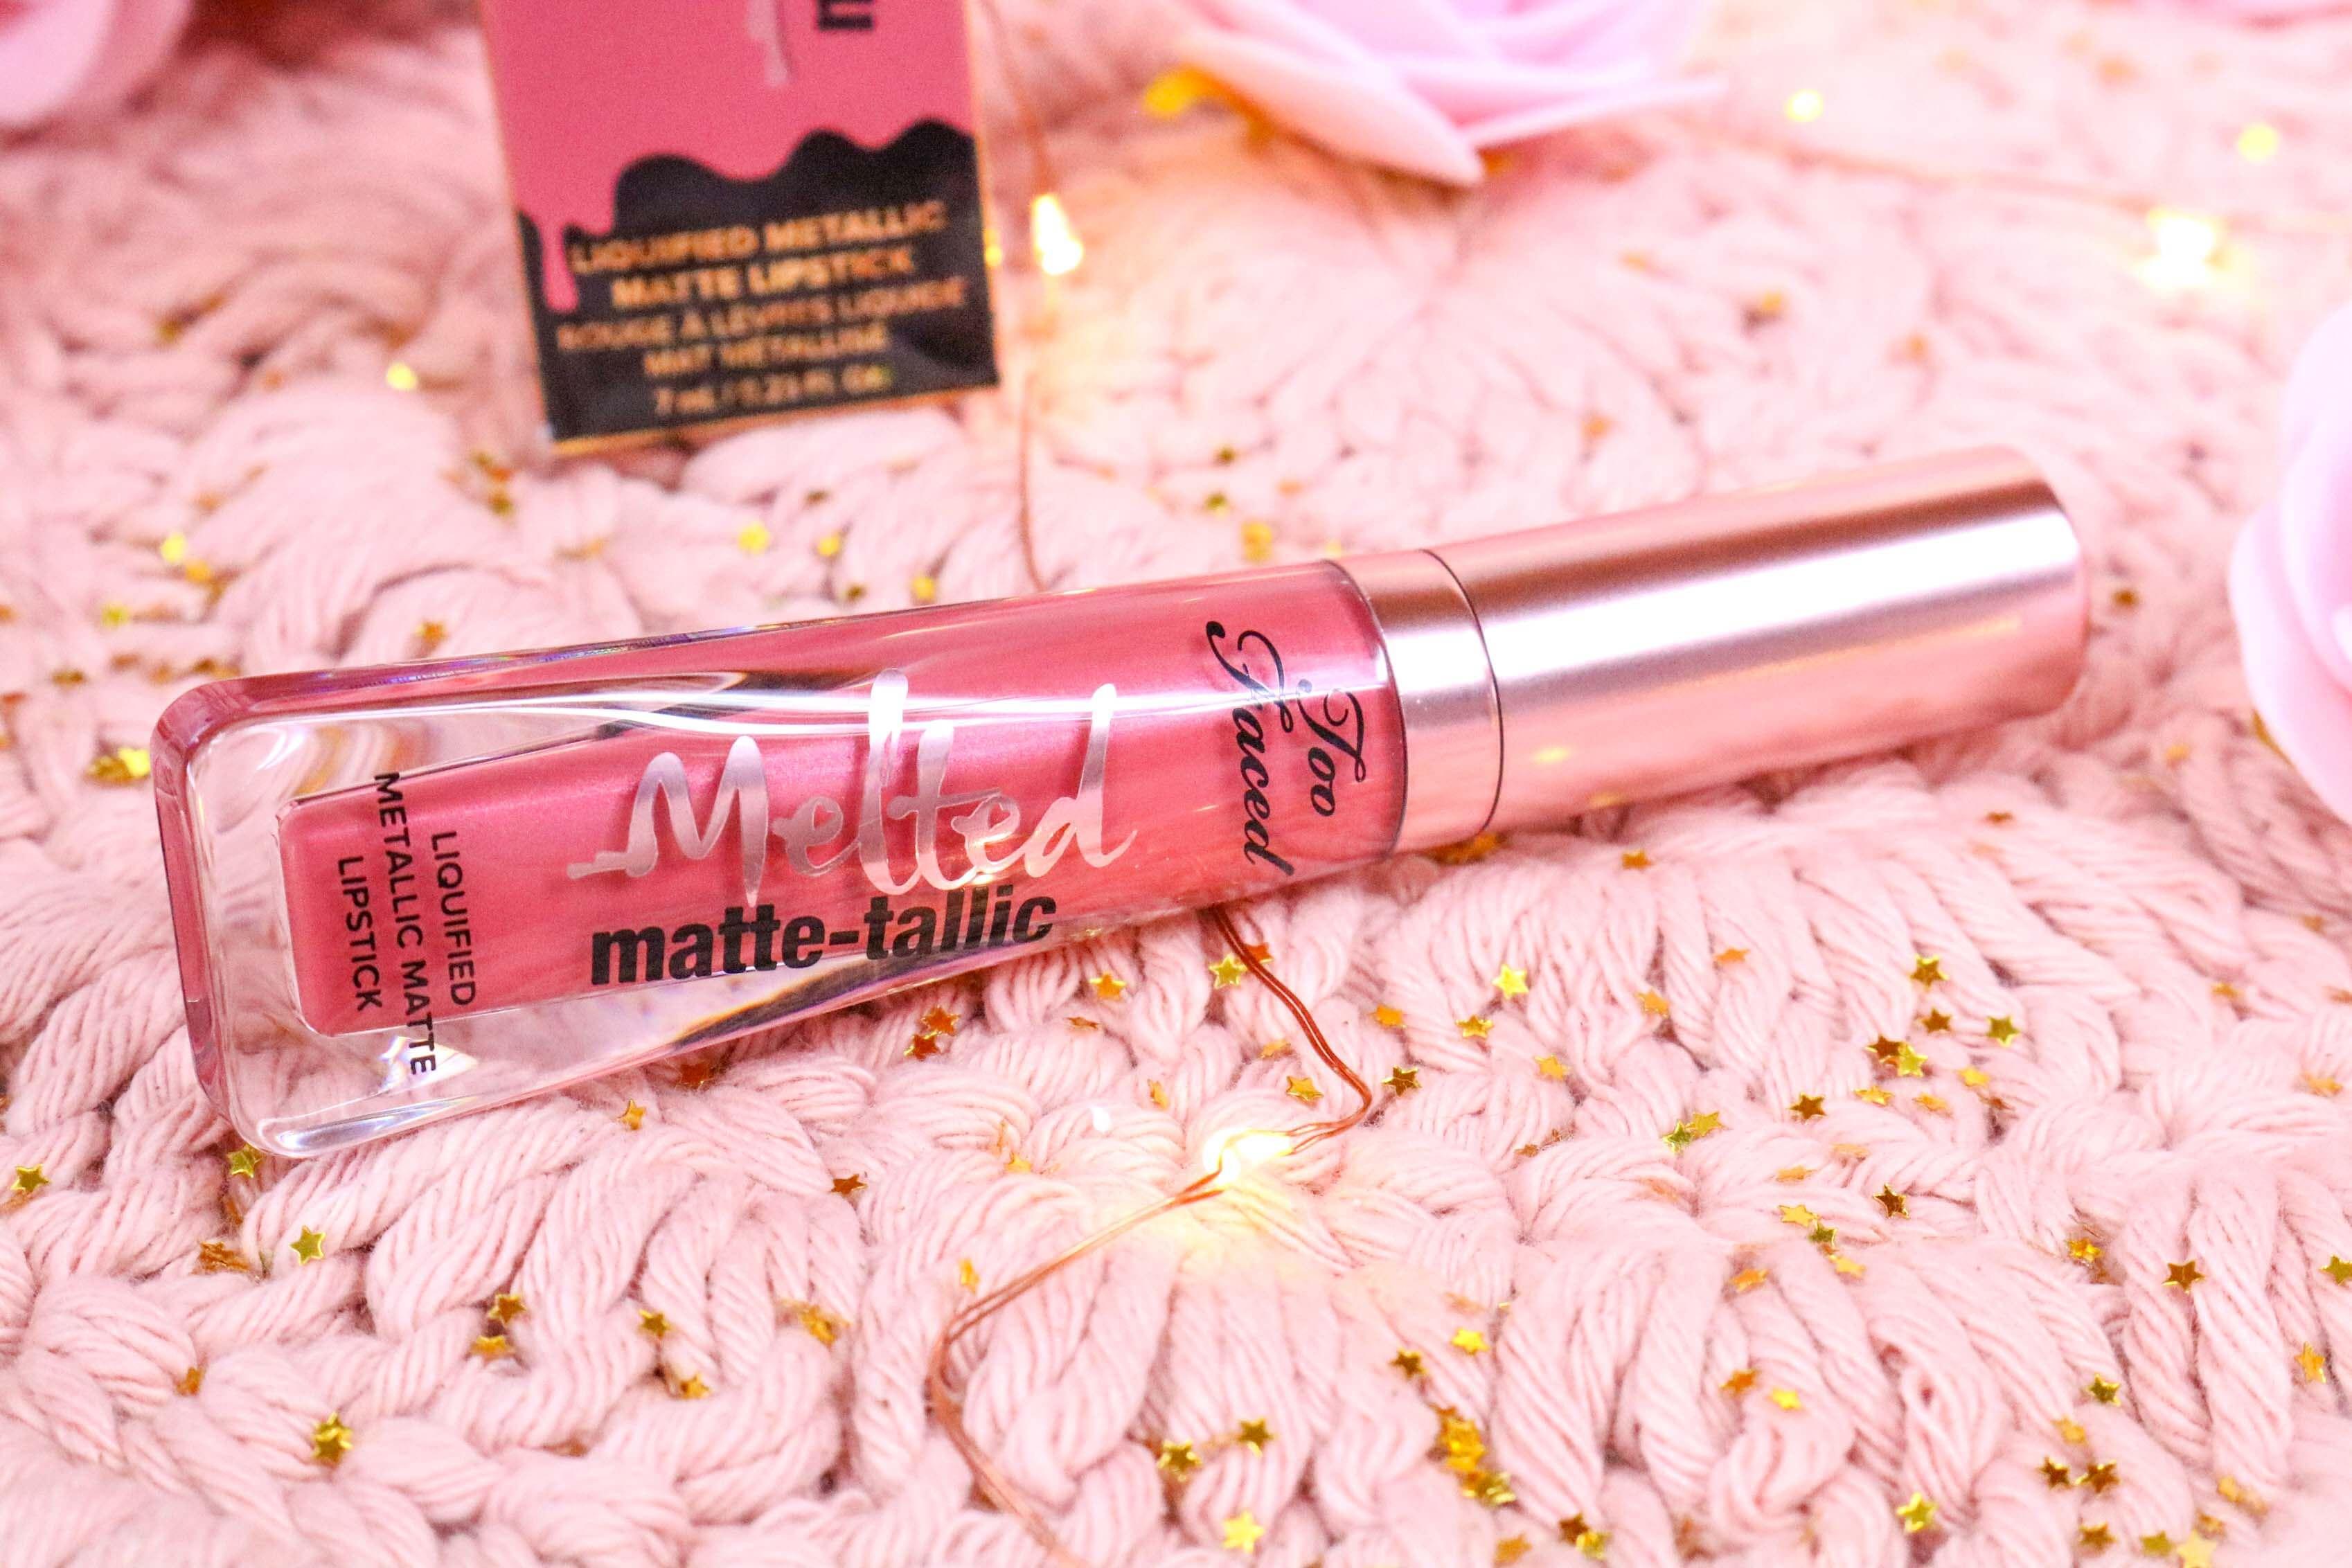 revue-melted-matte-tallic-rouge-a-levres-breakup-makeup-makeupbyazadig-sortie-france-influencer-swatch-avis-prix-lipstick